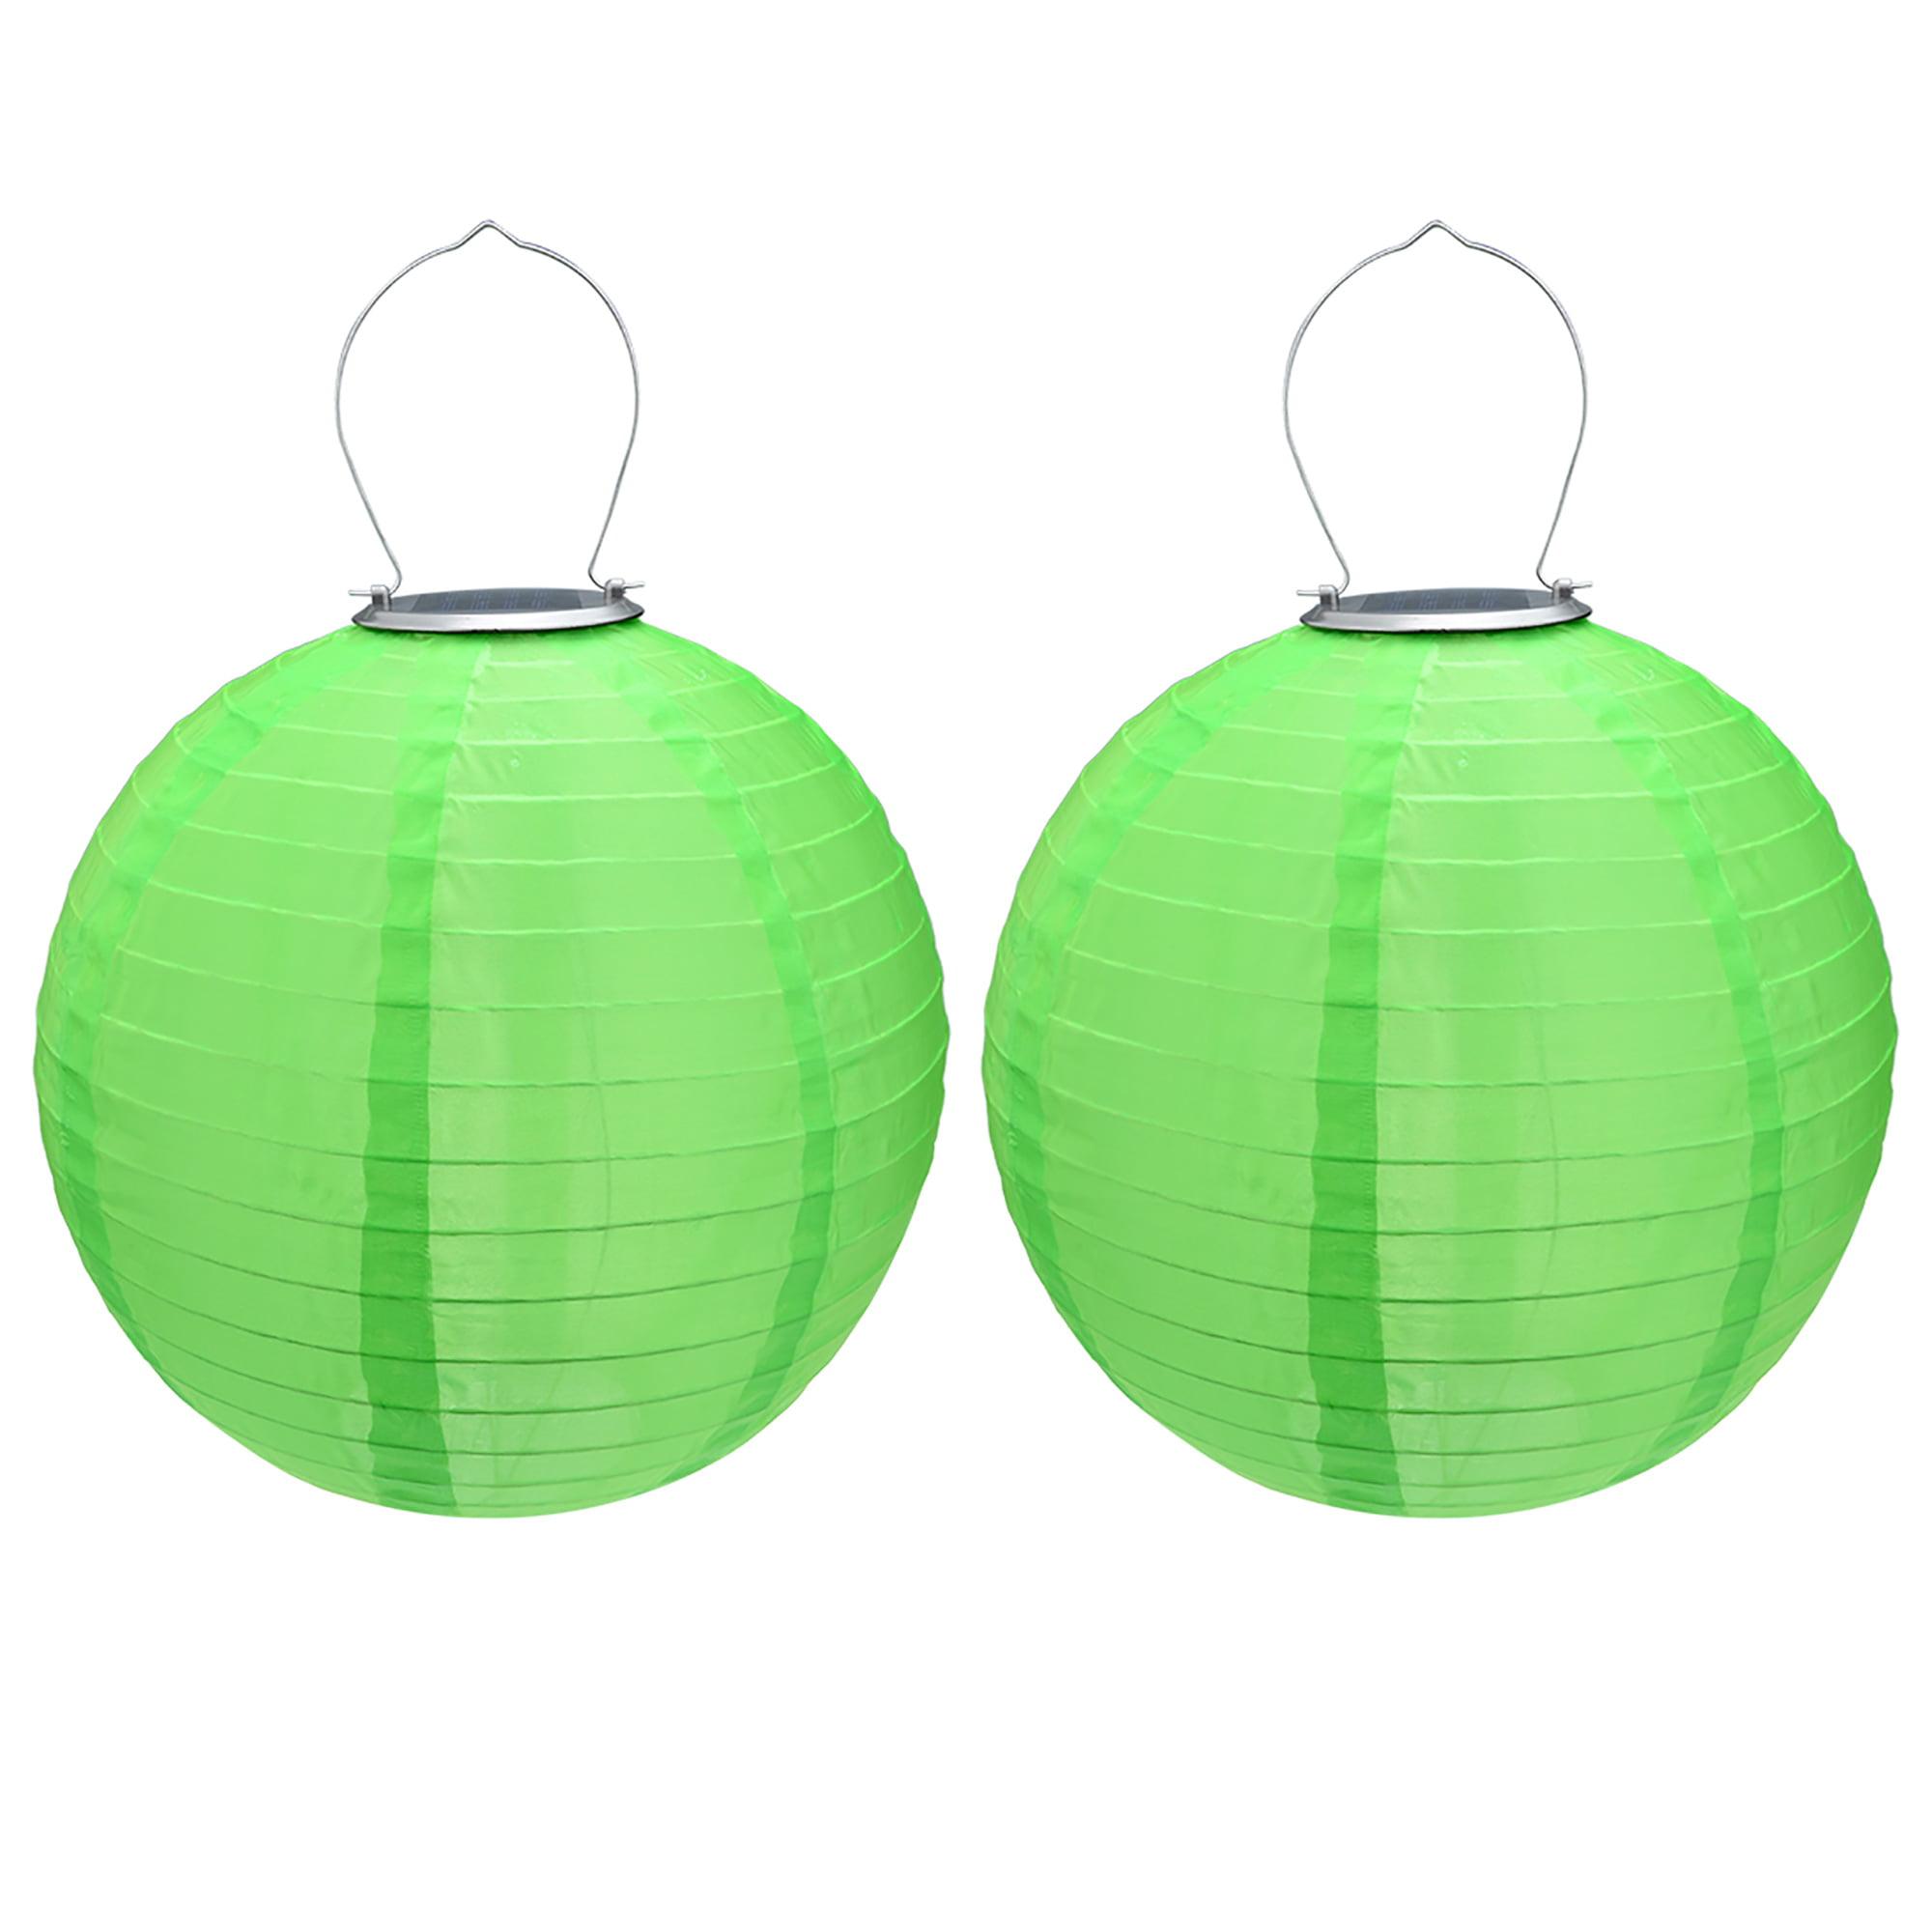 "2 Packs Green 12"" Solar Powered Lanterns Hanging Solar Lamps Garden"